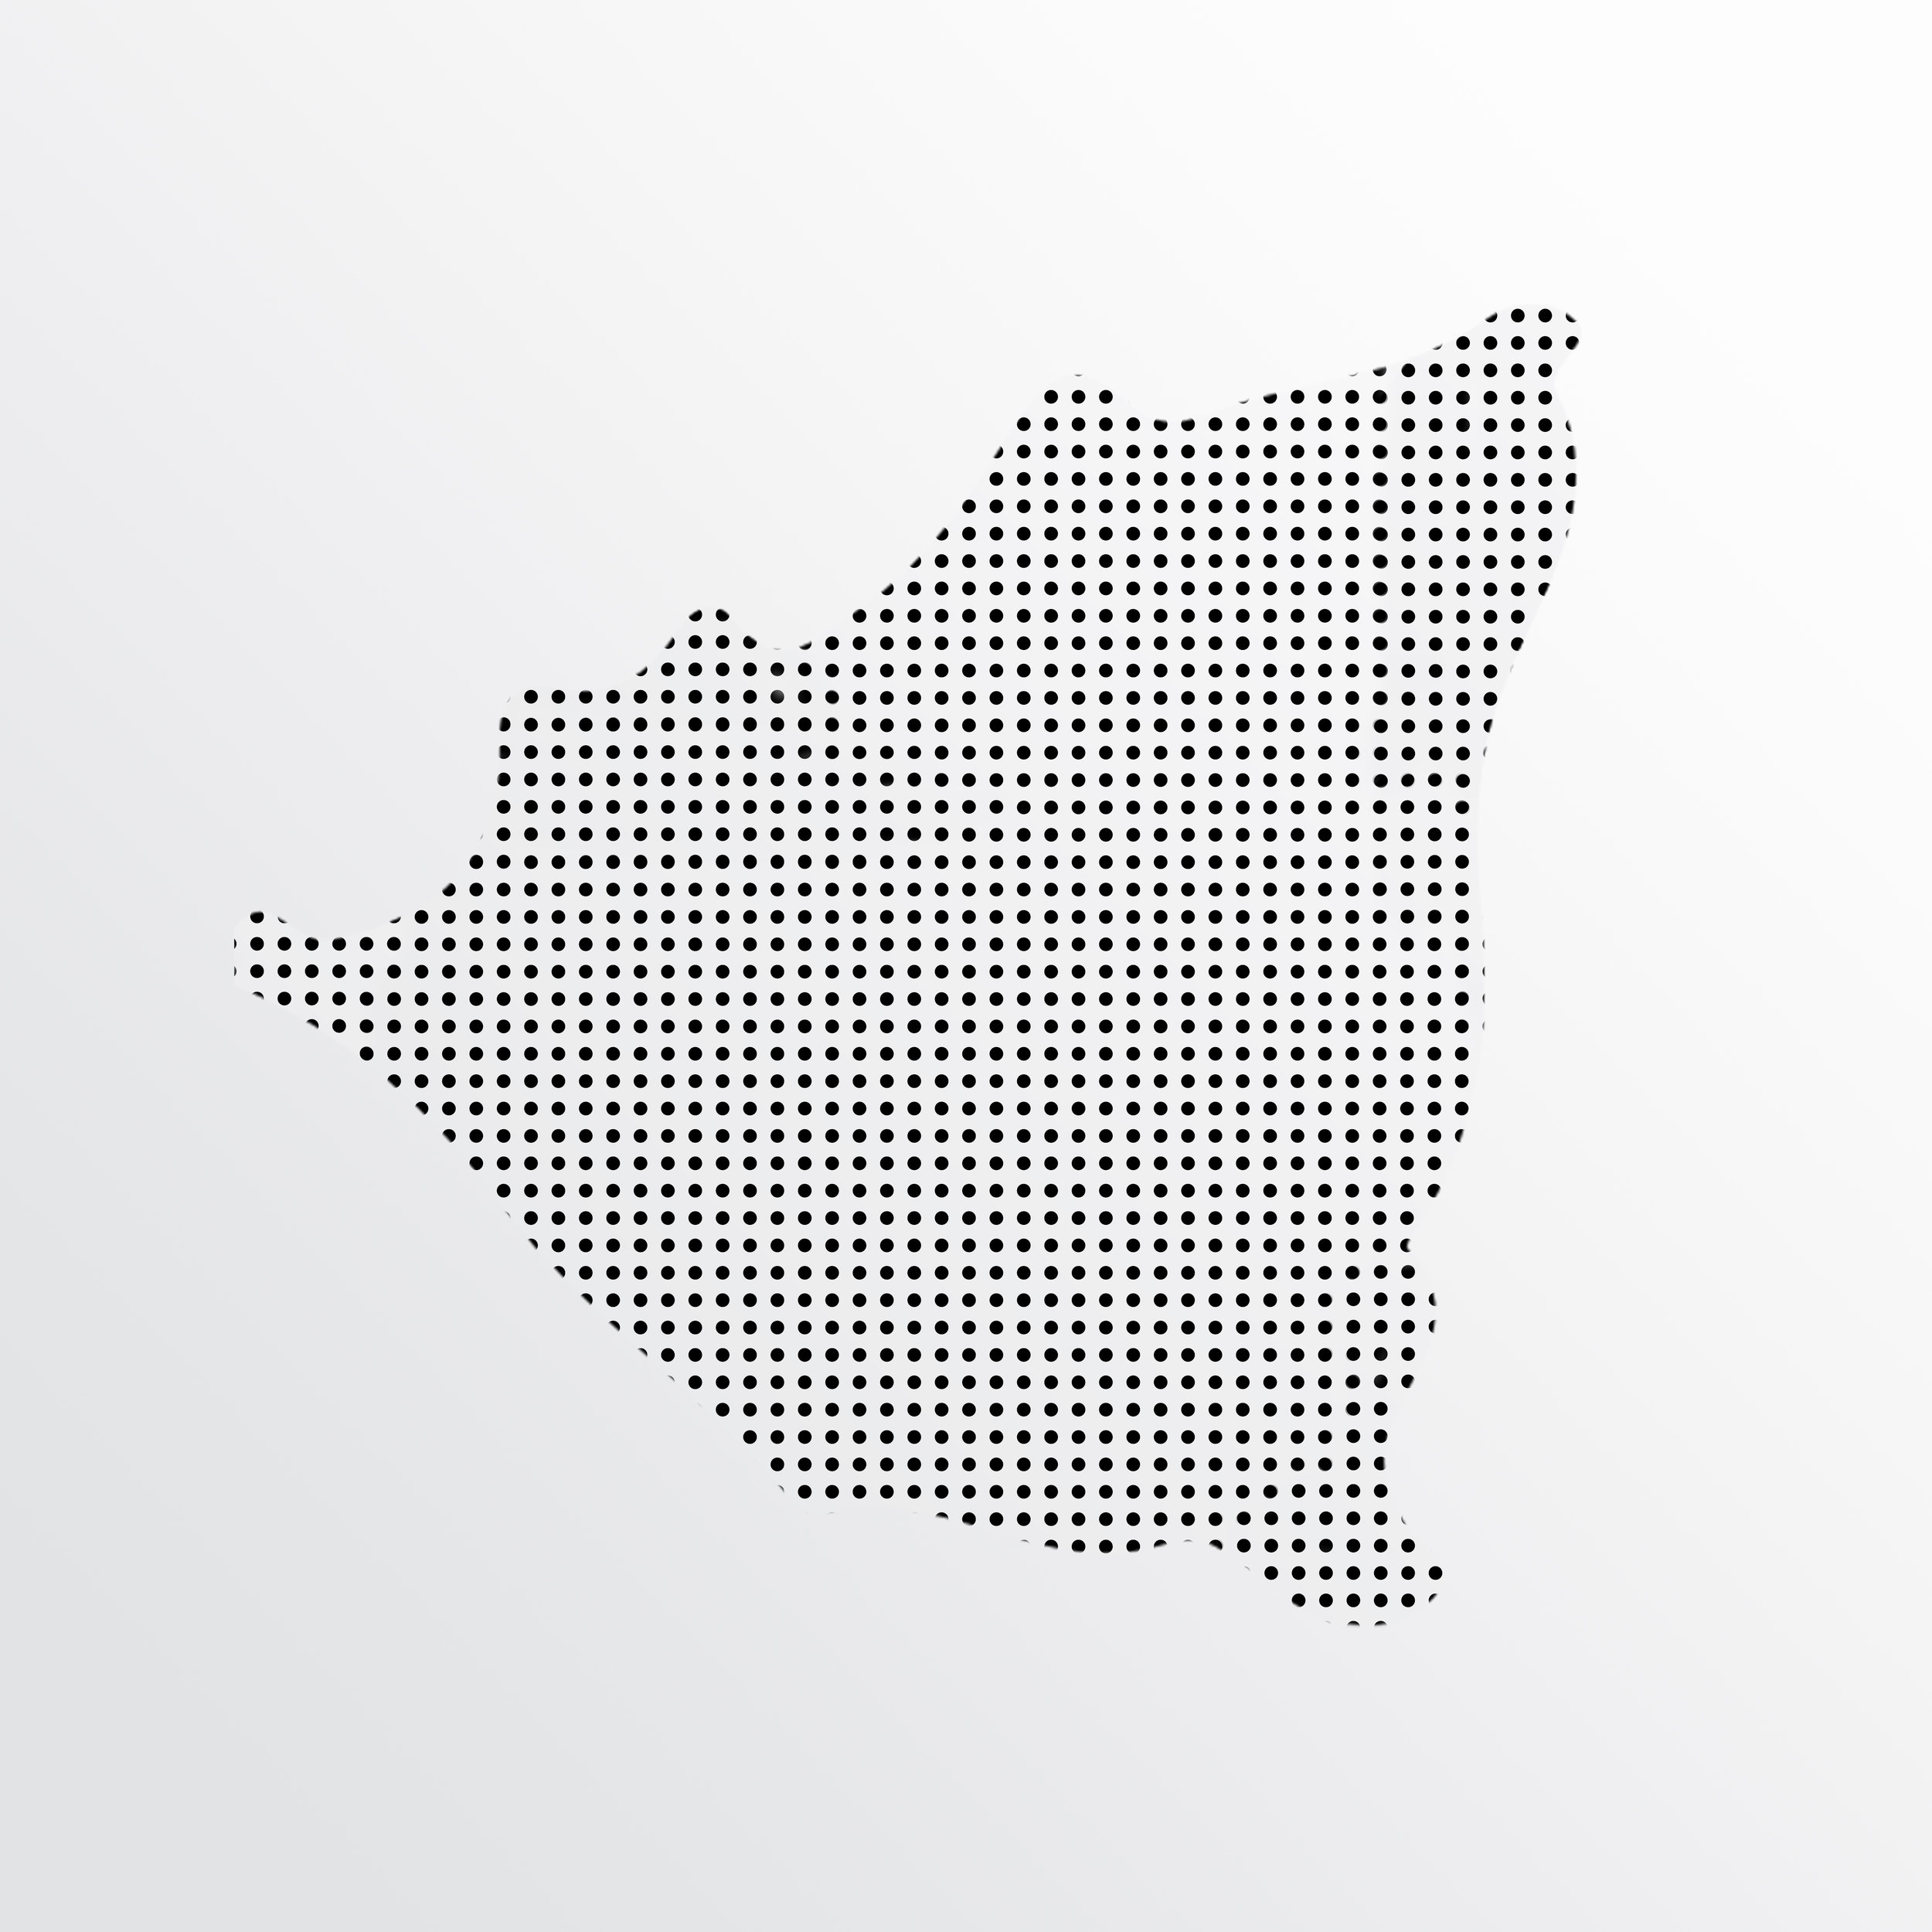 nicaragua map.jpg